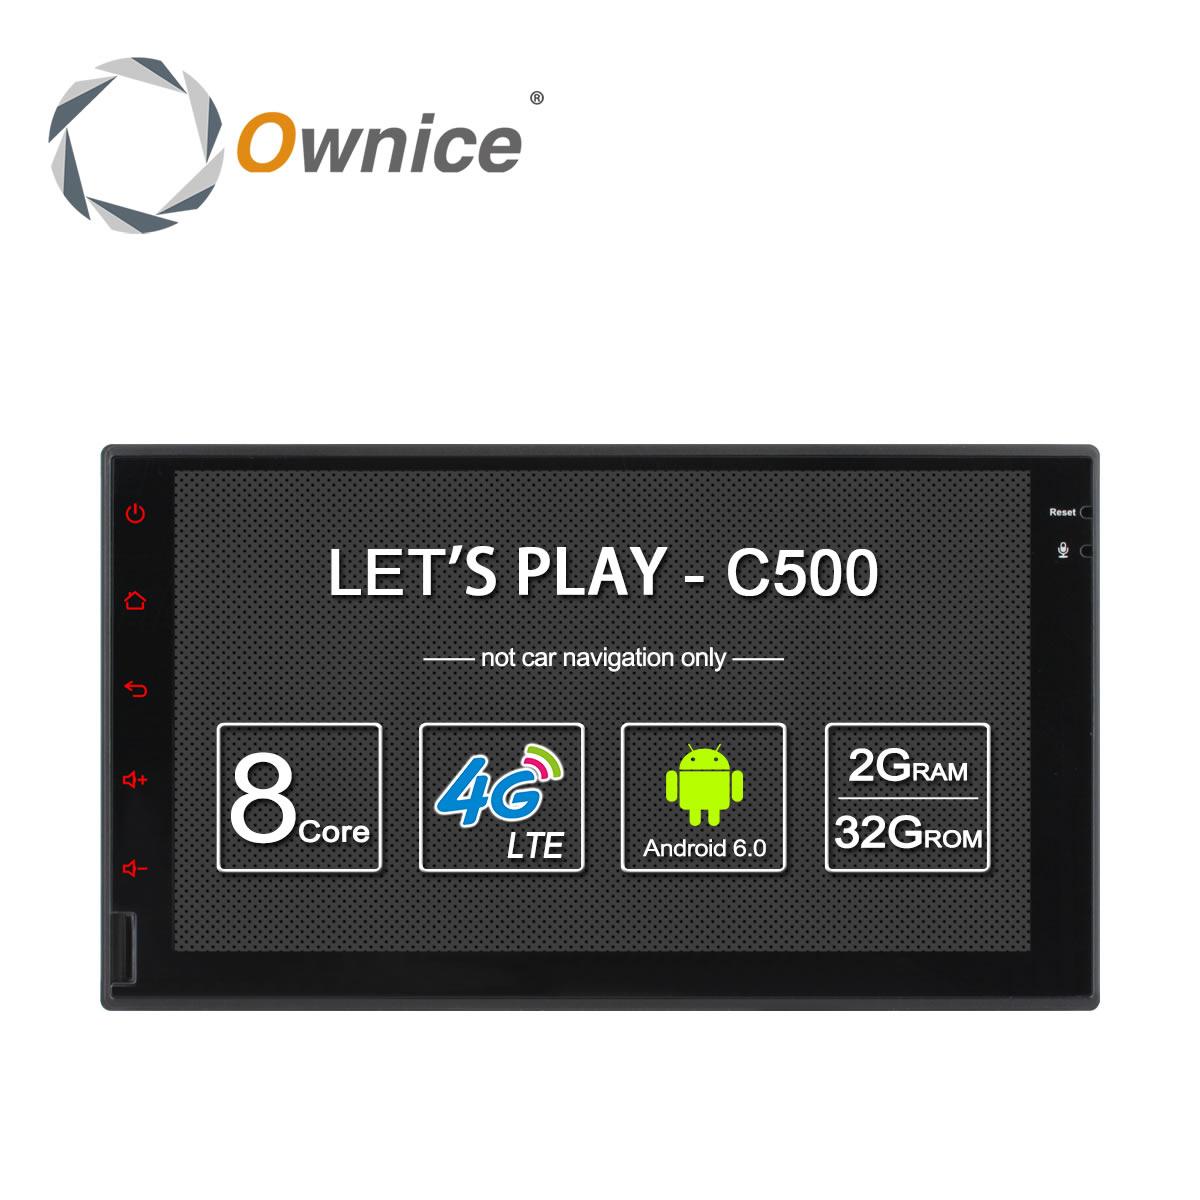 c434ac769f48b Ownice C500 Octa 8 Core Android 6,0 2G RAM 32 GB ROM soporte 4G LTE SIM red  Coche GPS 2 din Universal car Radio player no dvd